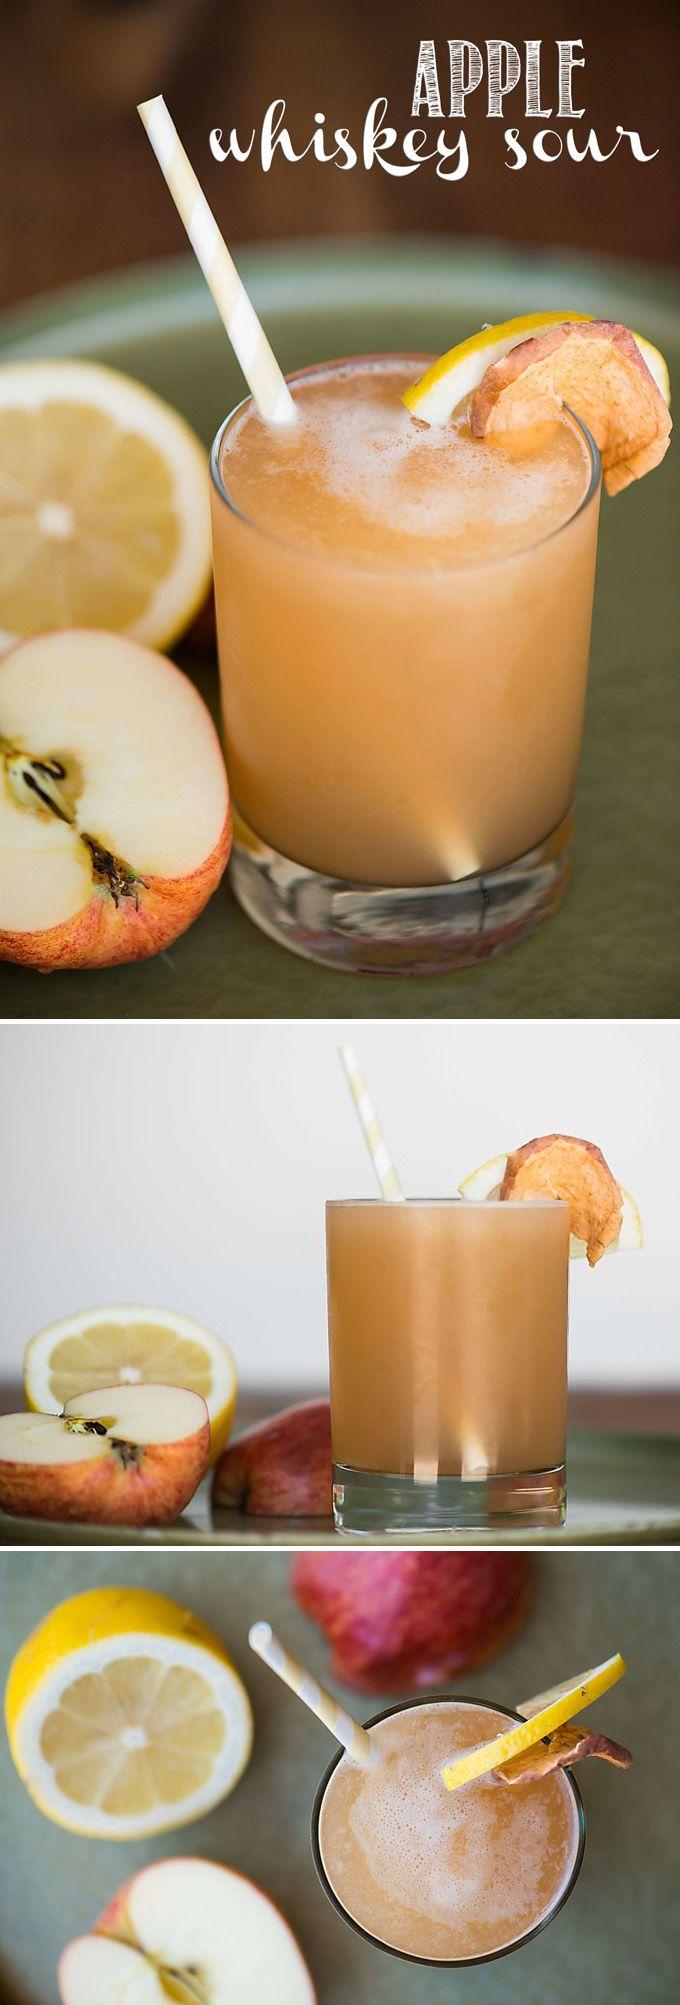 Best 25 blended alcoholic drinks ideas on pinterest for Hot alcoholic beverages